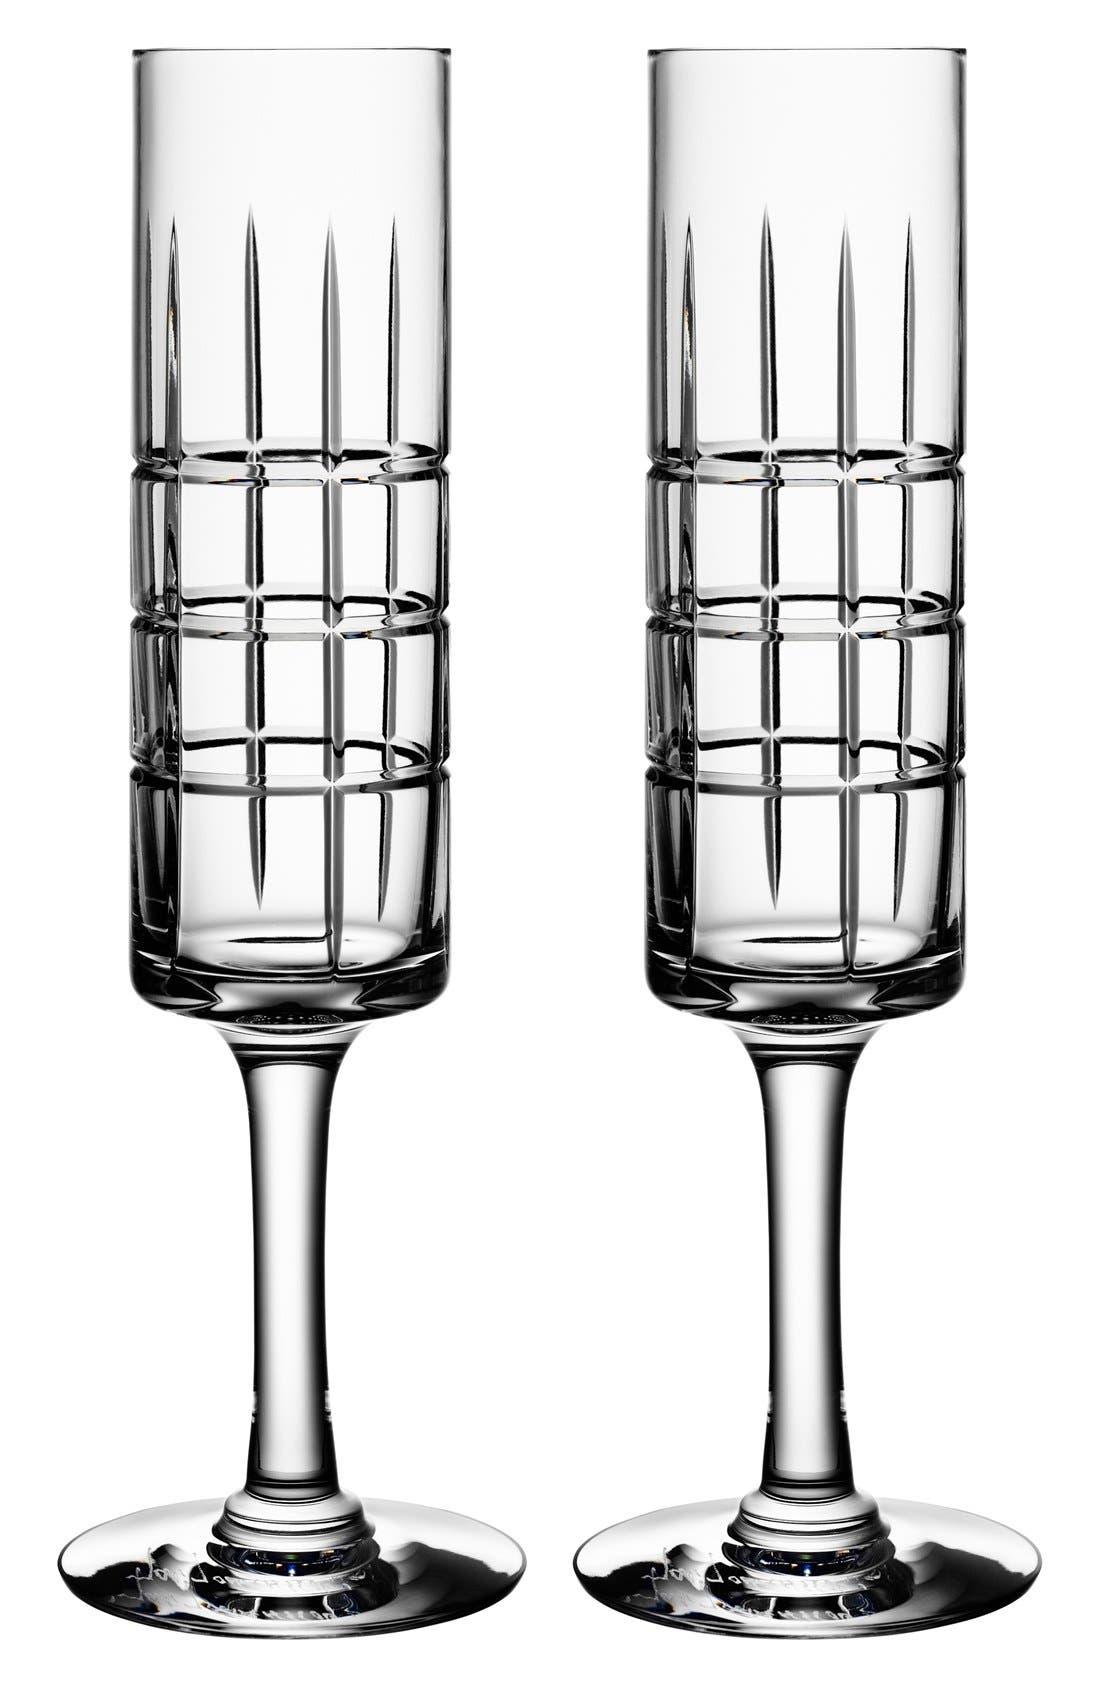 Main Image - Orrefors'Street' Crystal ChampagneFlutes (Set of 2)